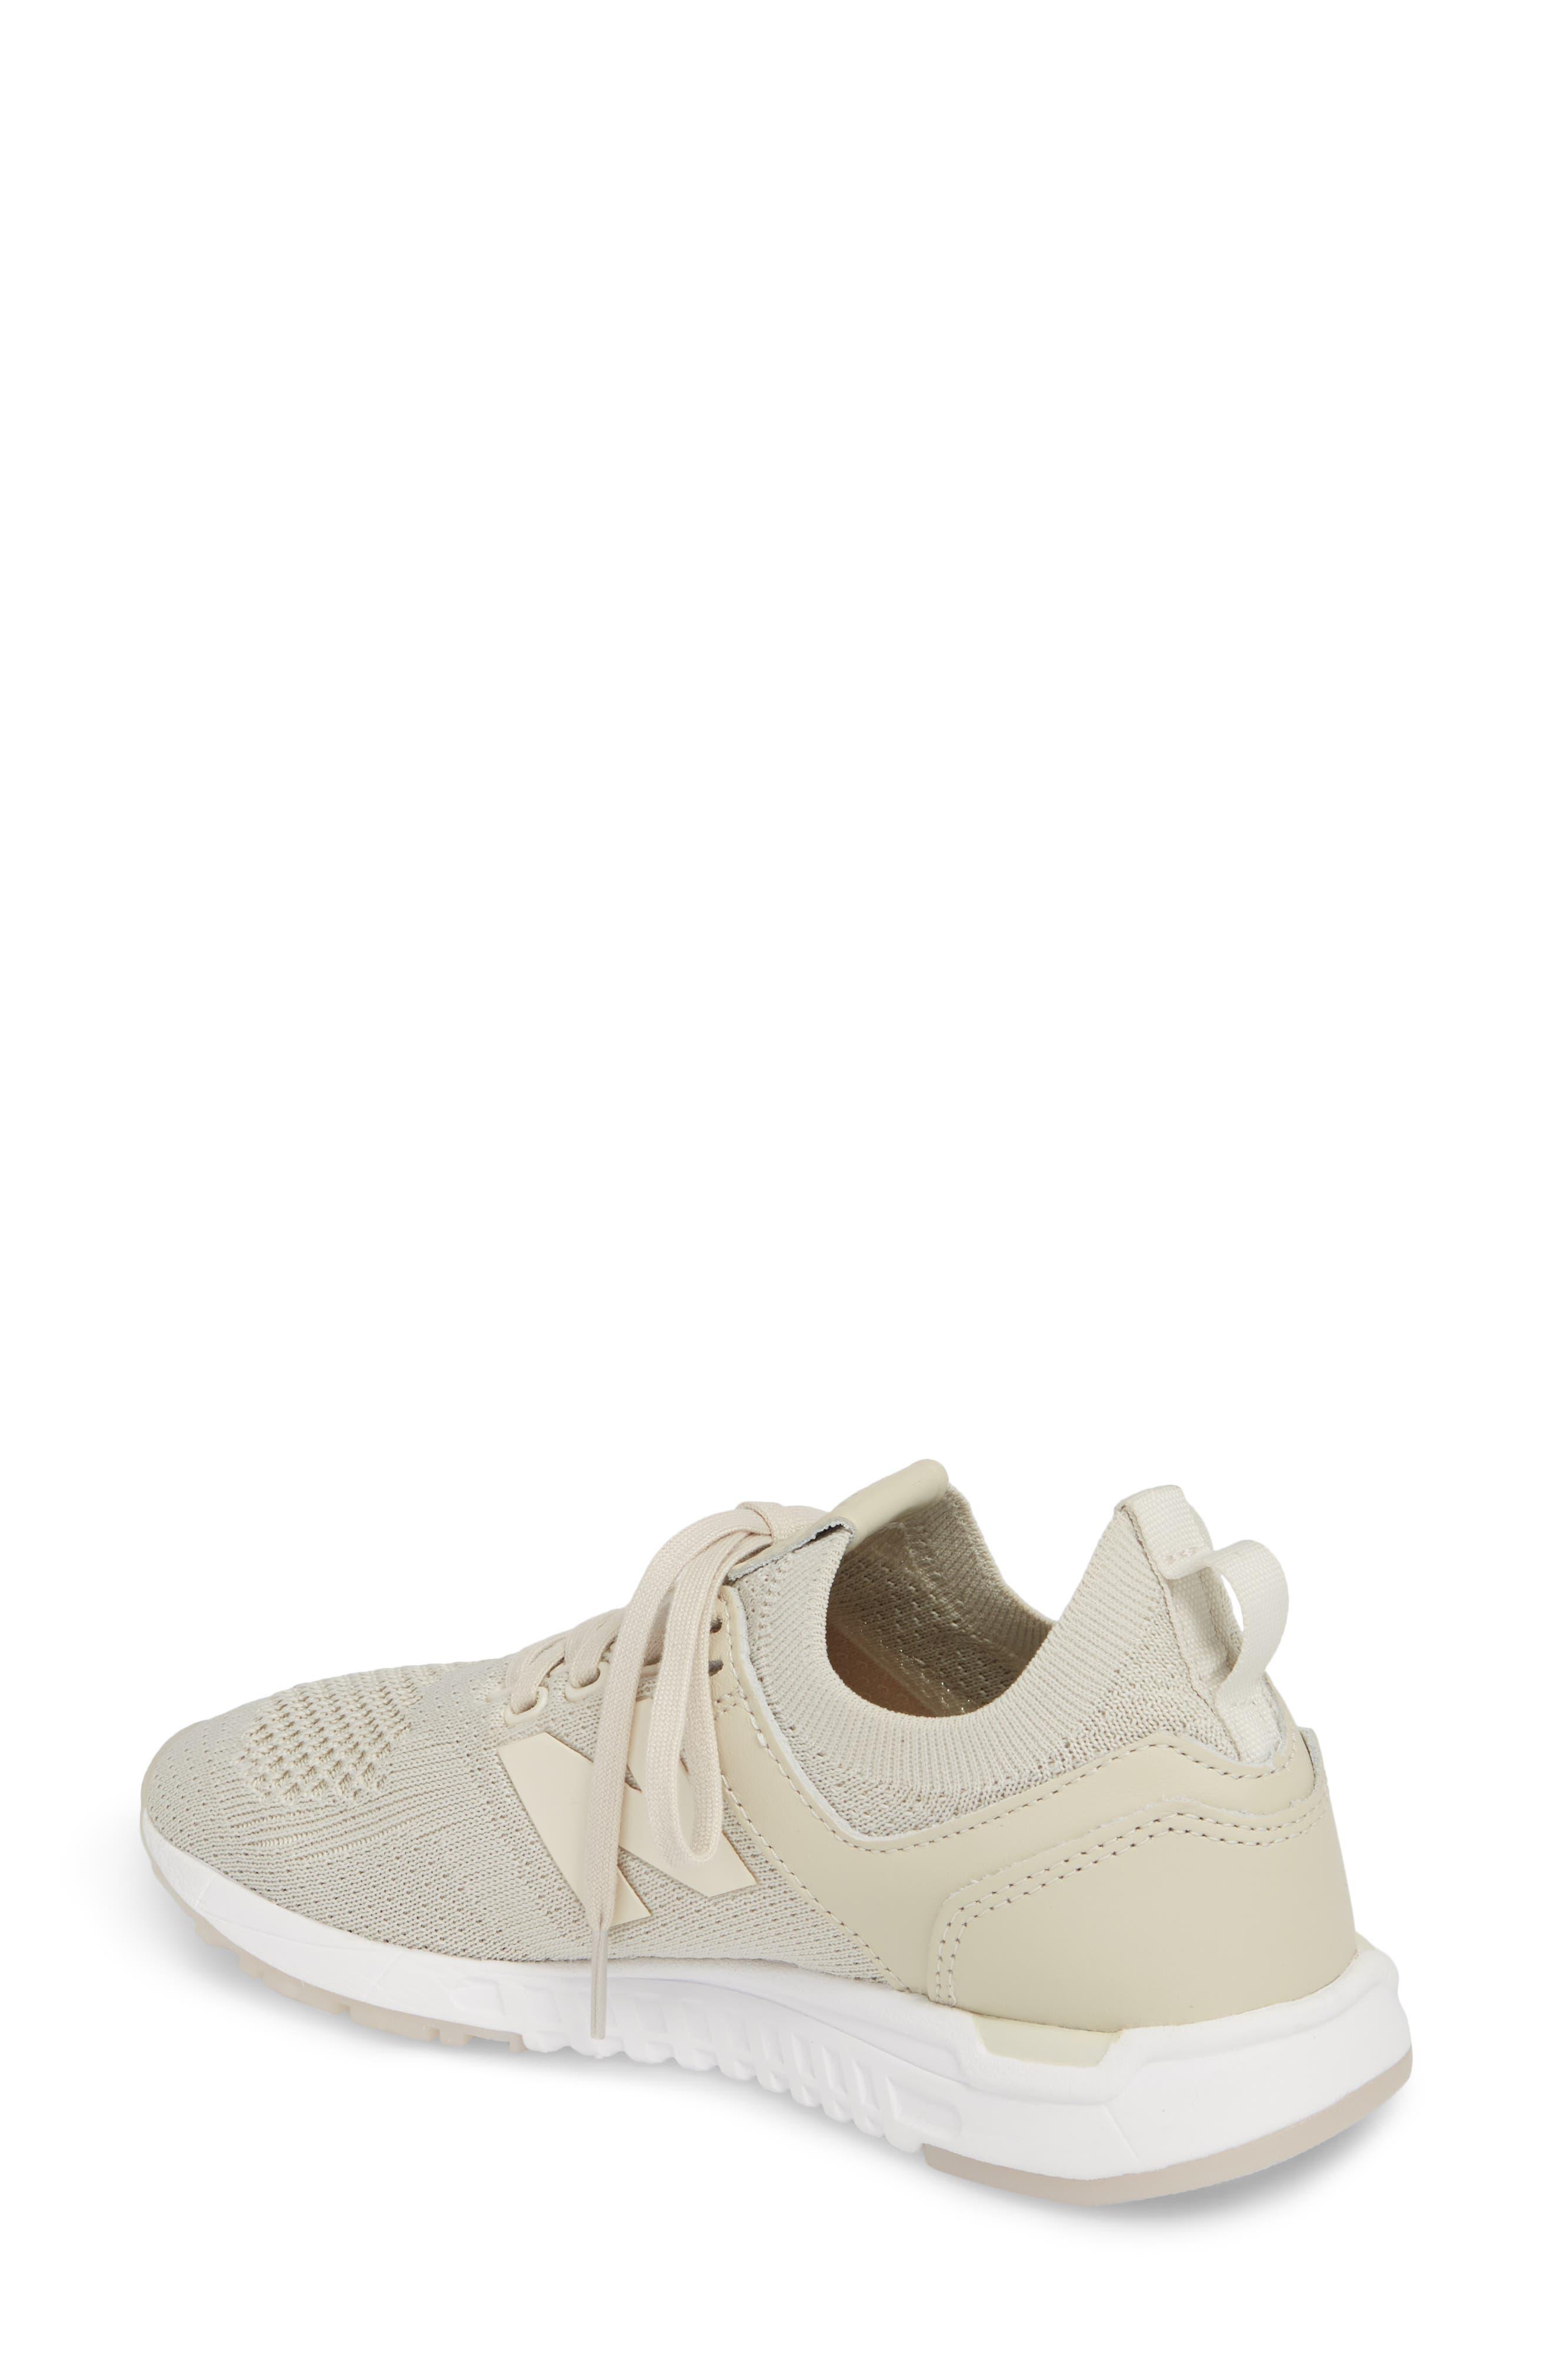 247 Decon Knit Sneaker,                             Alternate thumbnail 2, color,                             Moonbeam